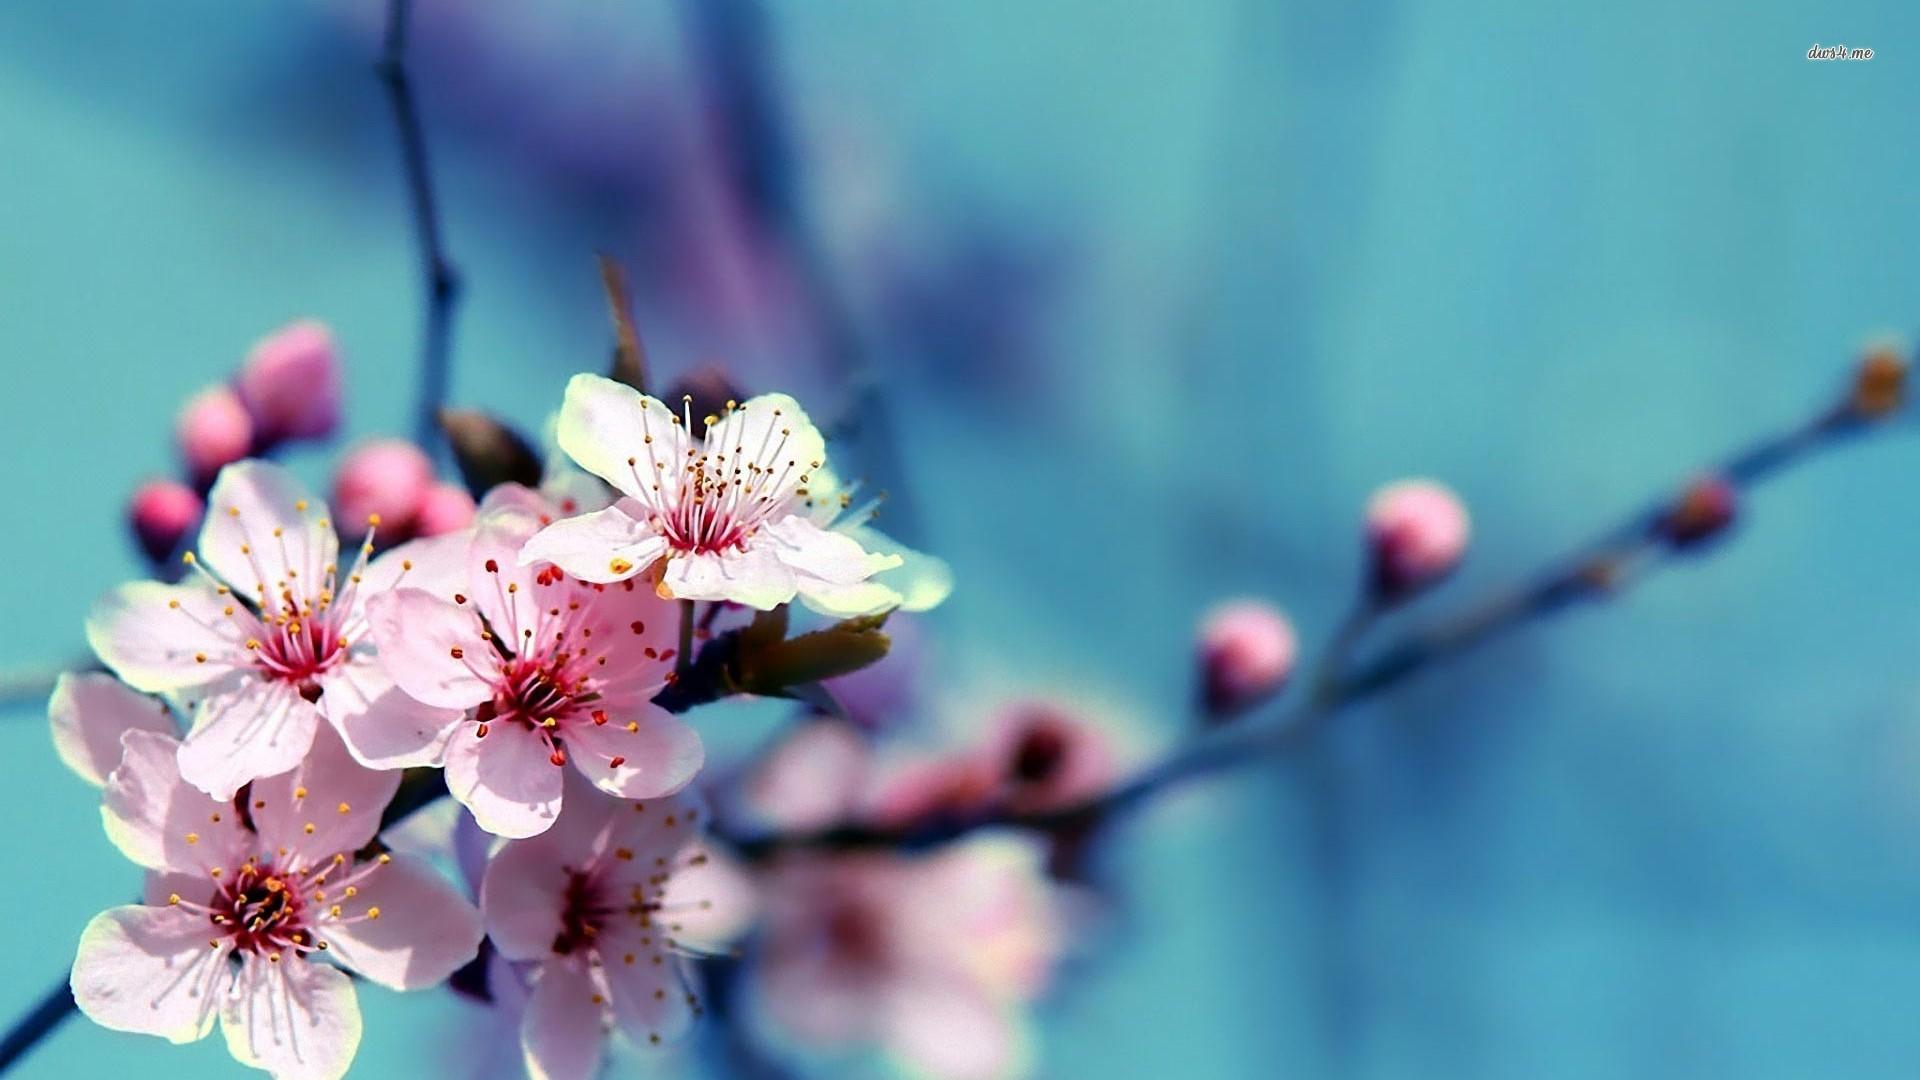 cherry blossom wallpaper hd wallpapersafari. Black Bedroom Furniture Sets. Home Design Ideas